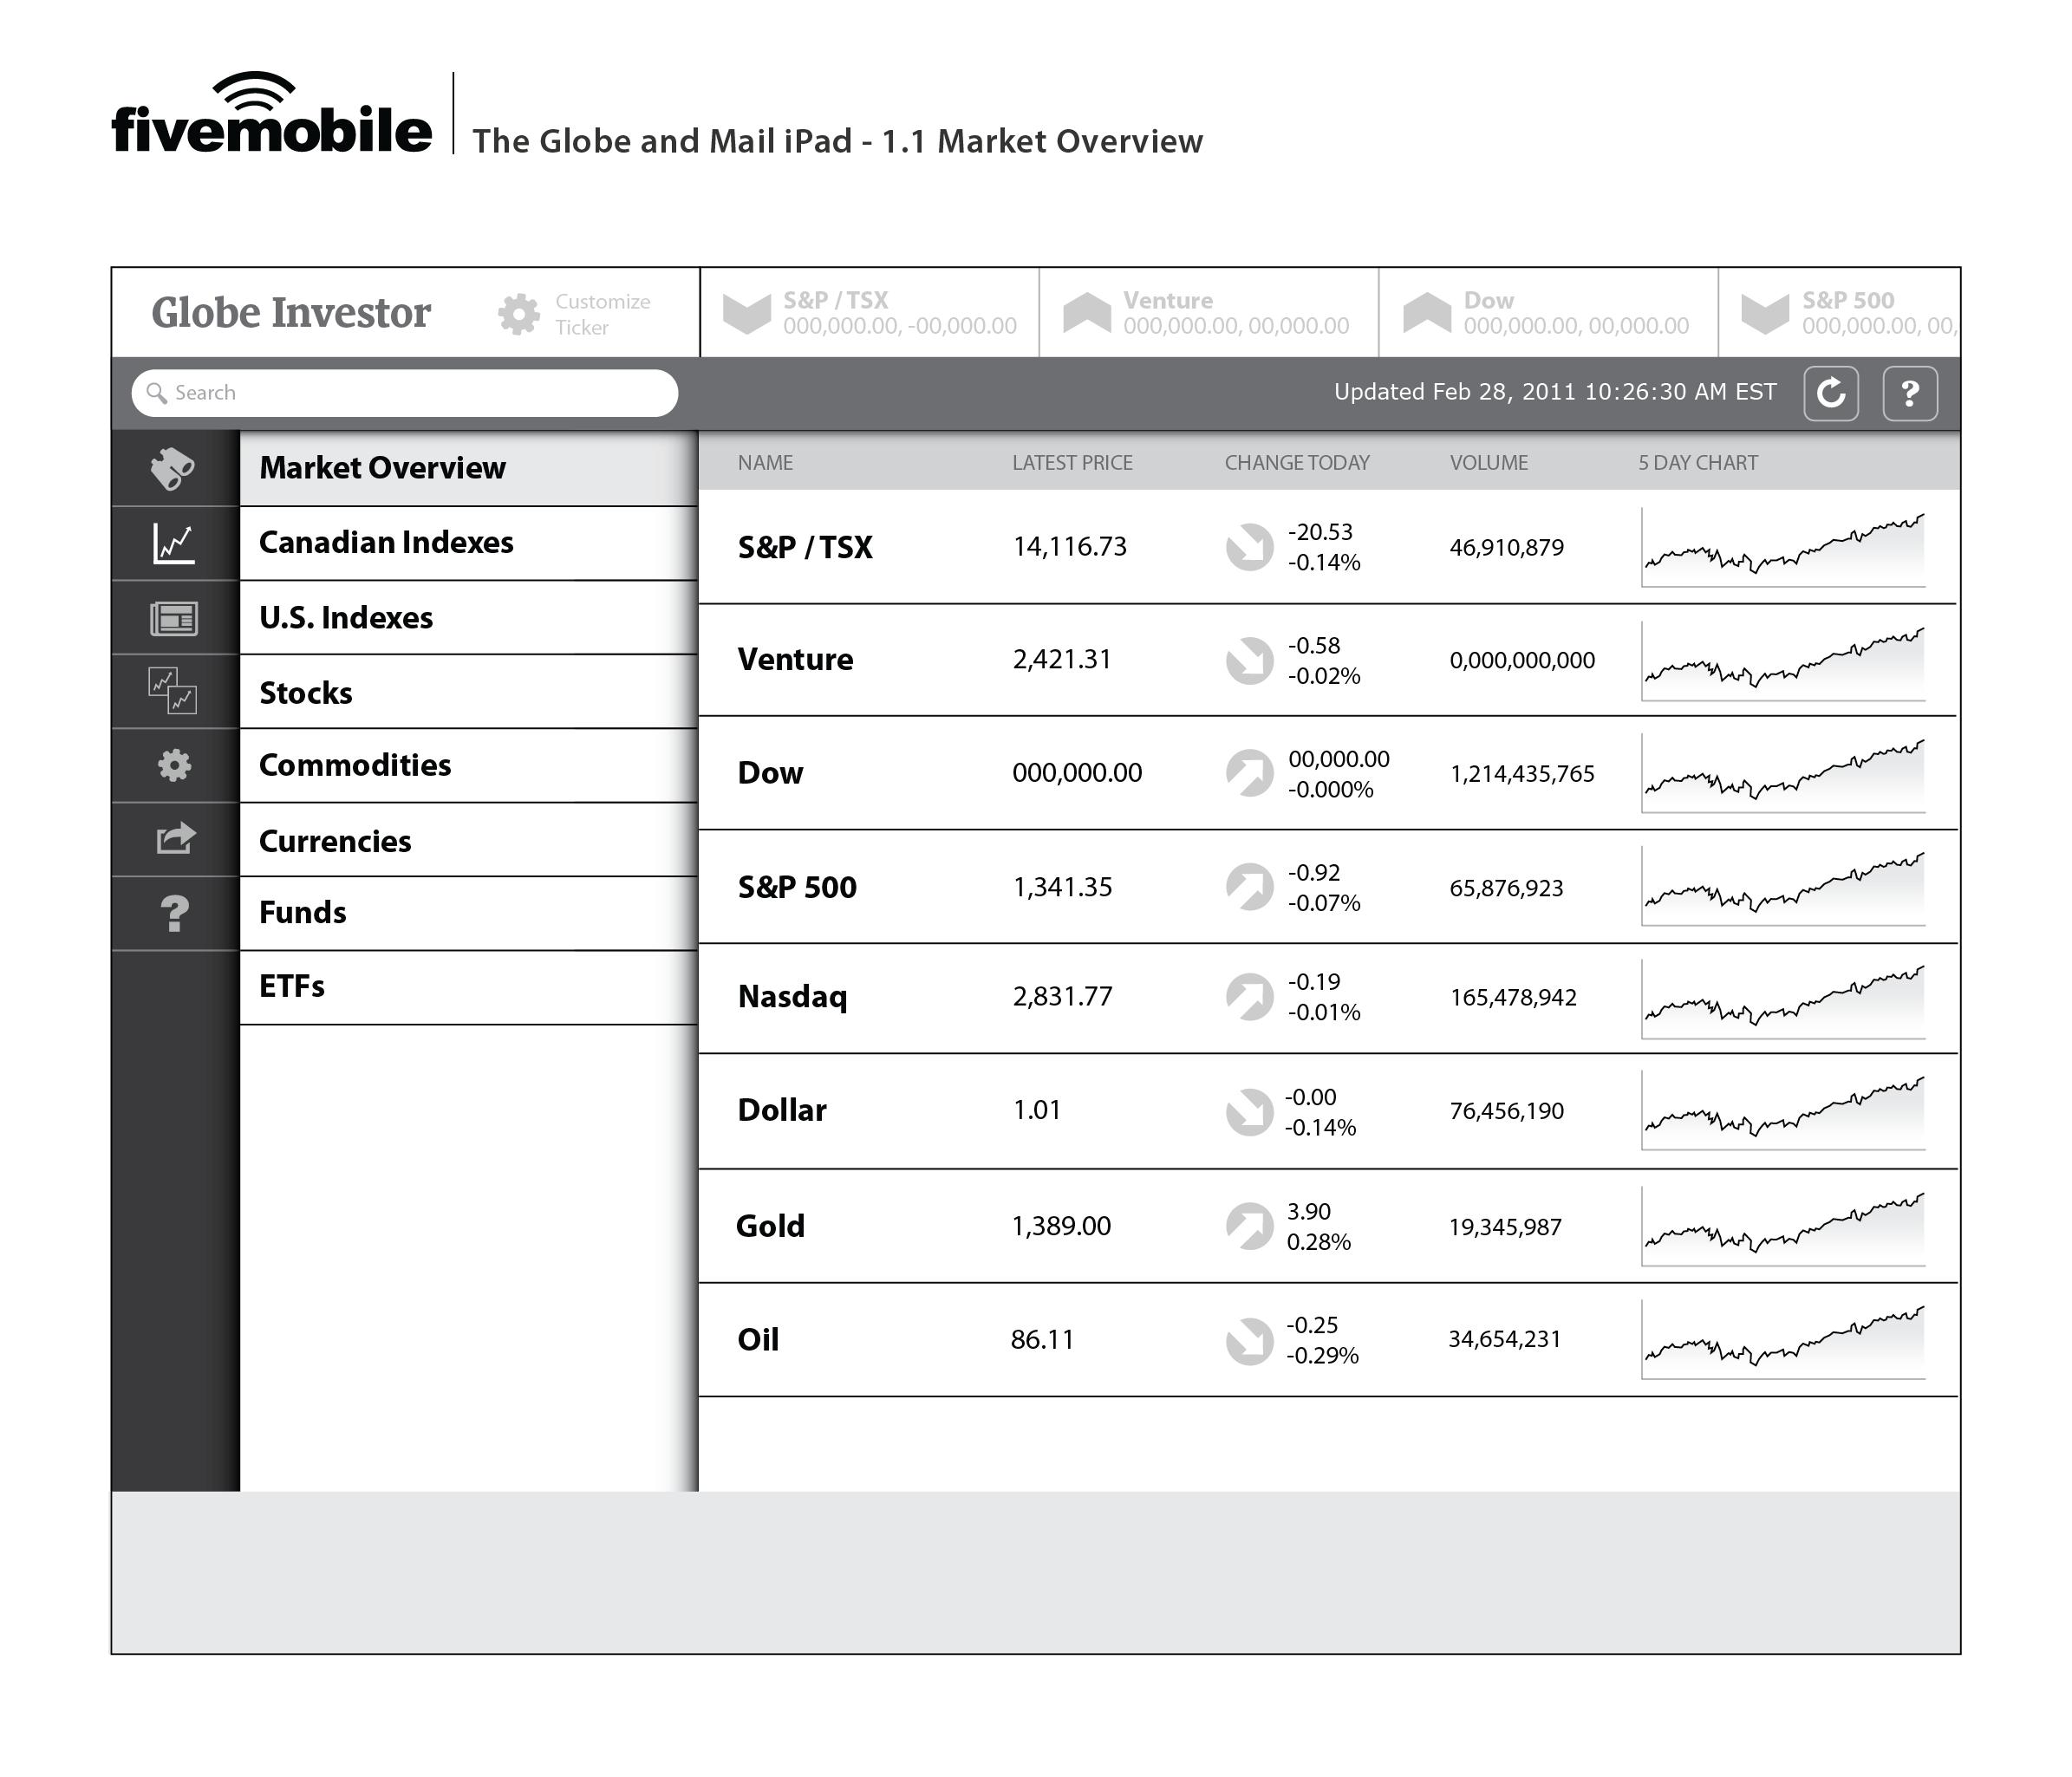 globe_investor_iPad_concepts_july5-02.png